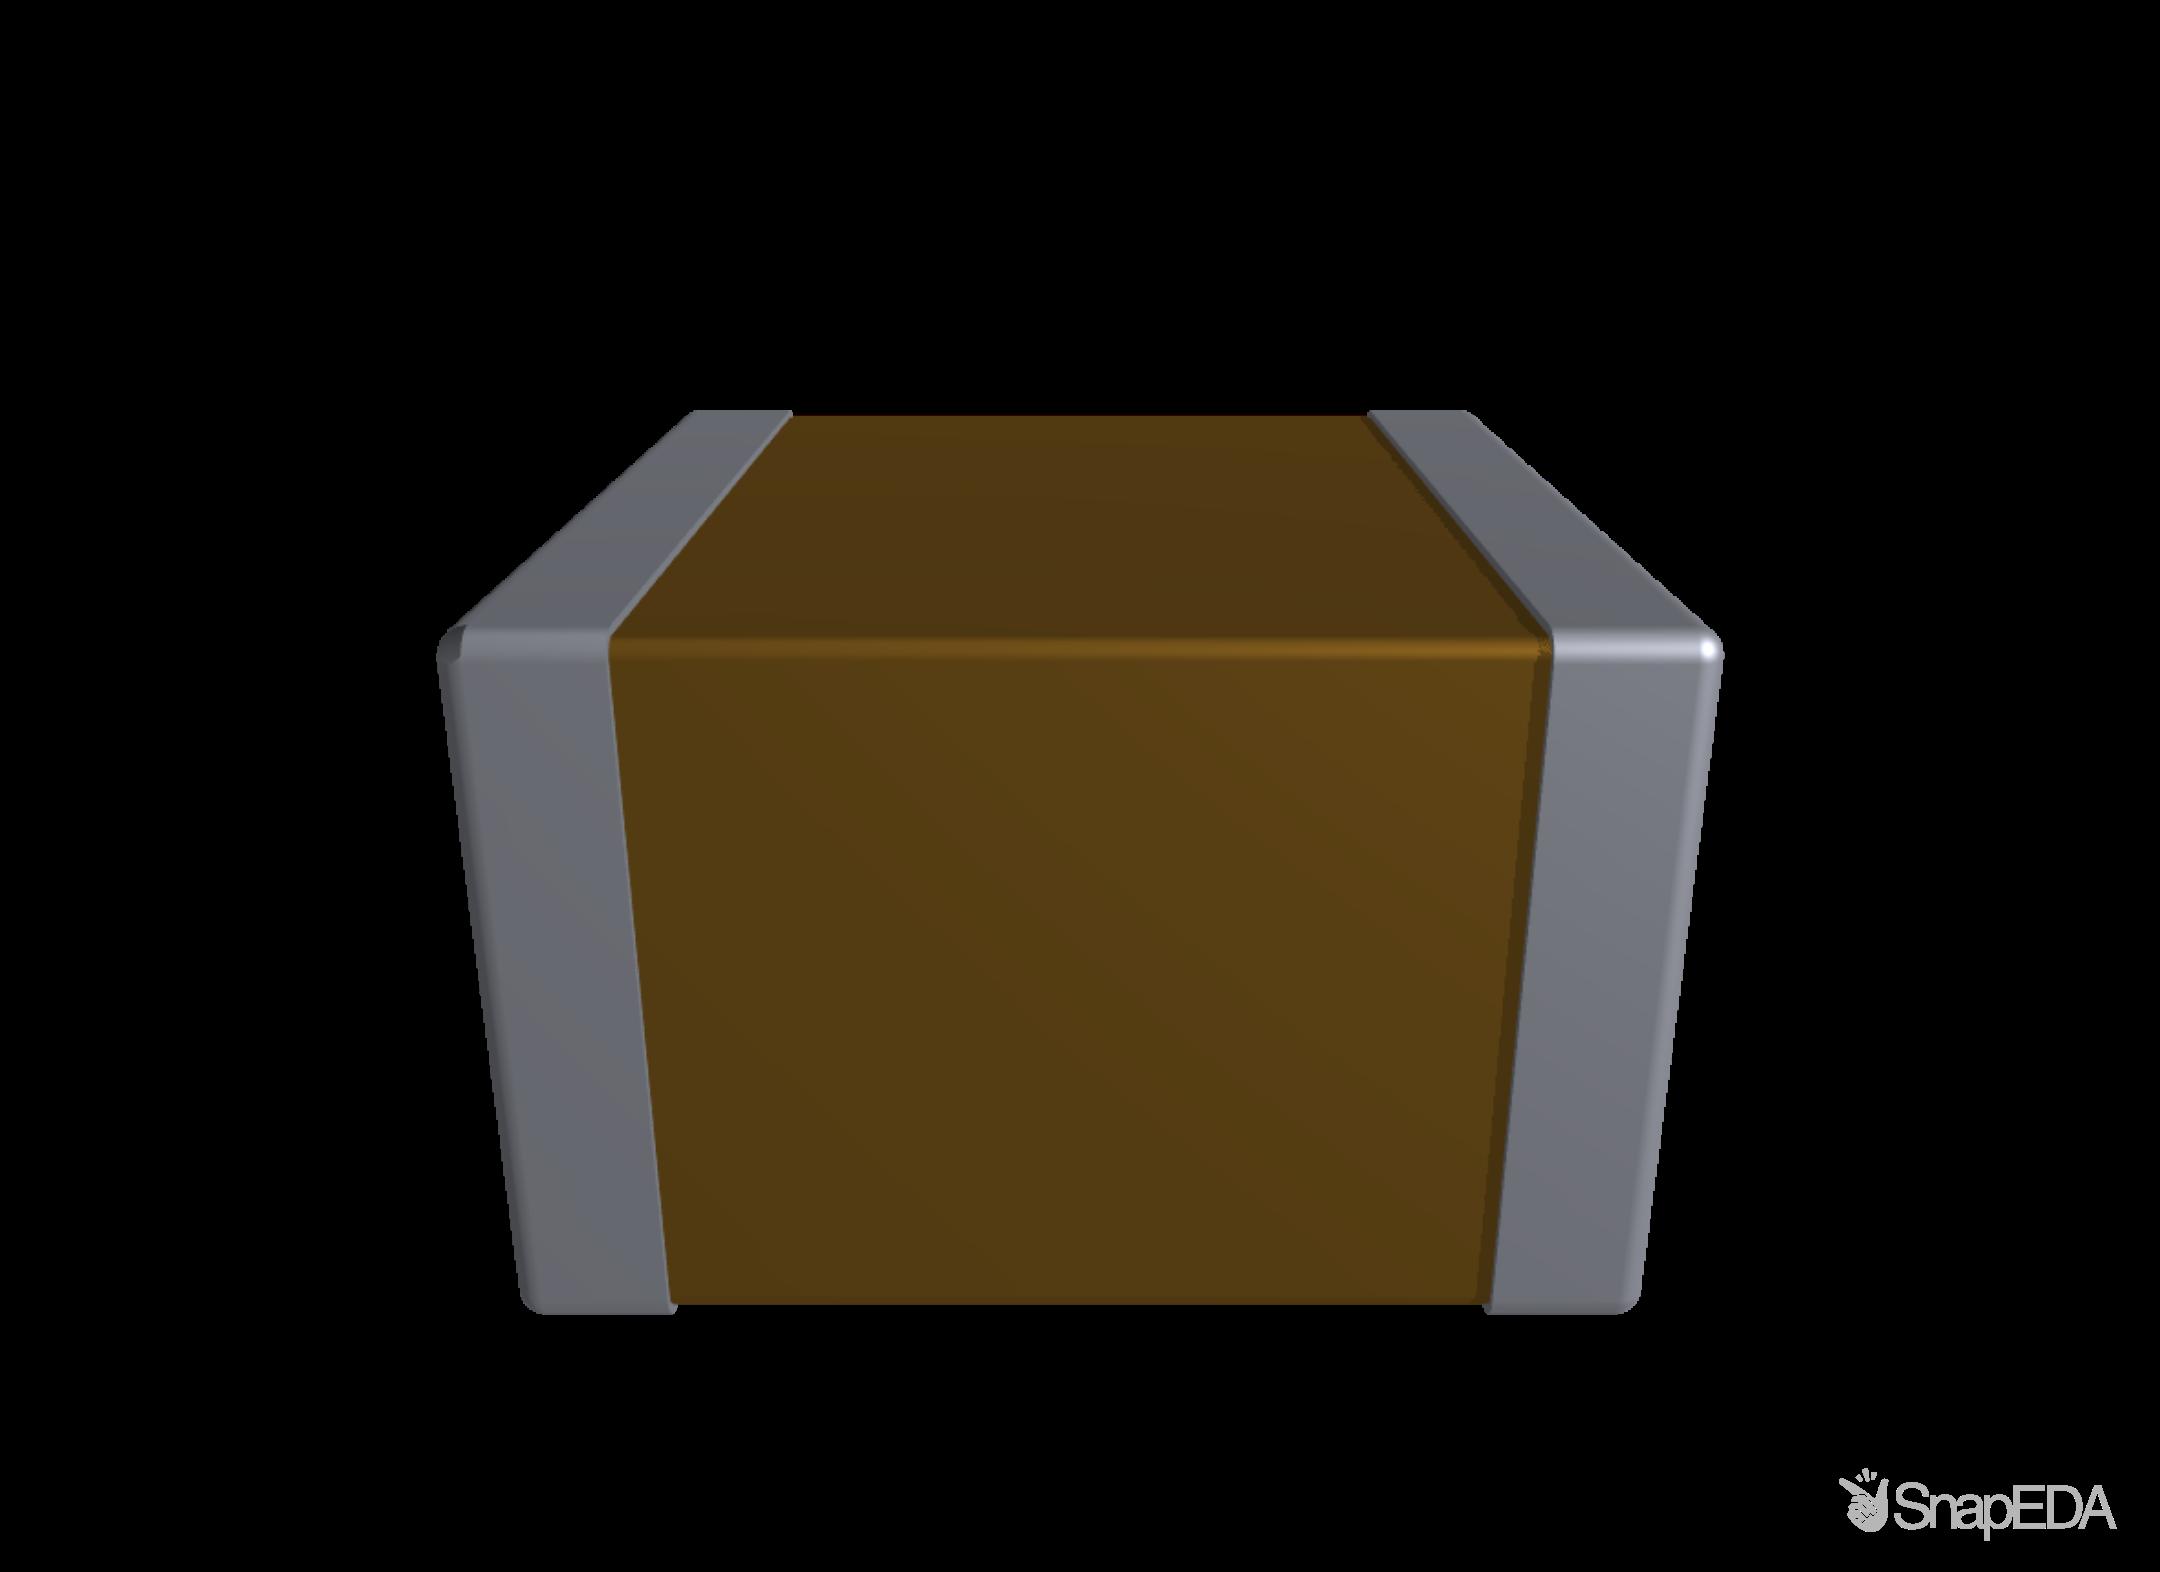 1111J1K06P20CQT 3D Model